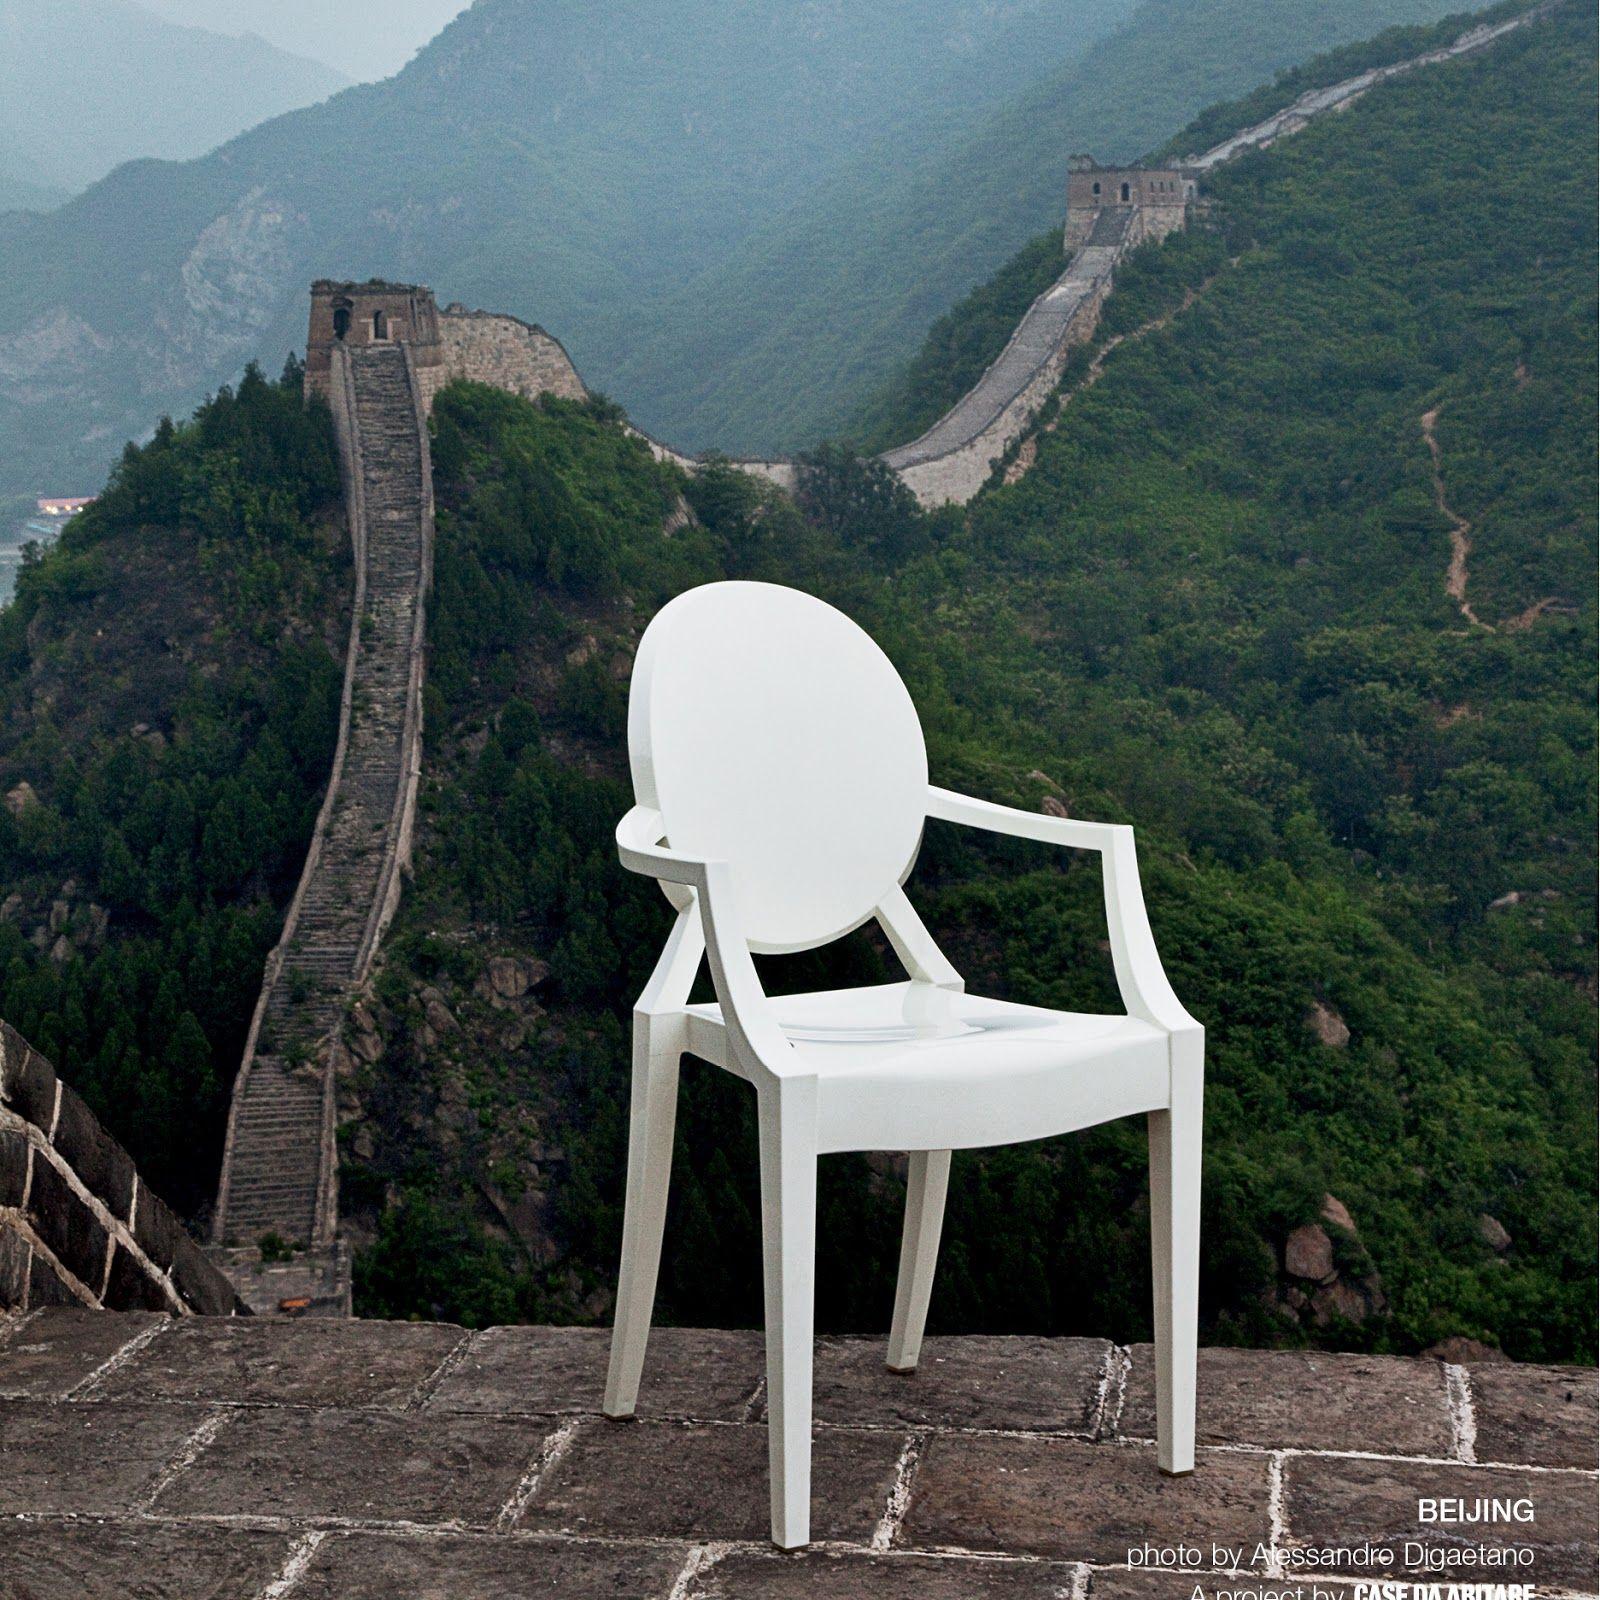 kartell louis ghost chair sale beijing stardust modern design